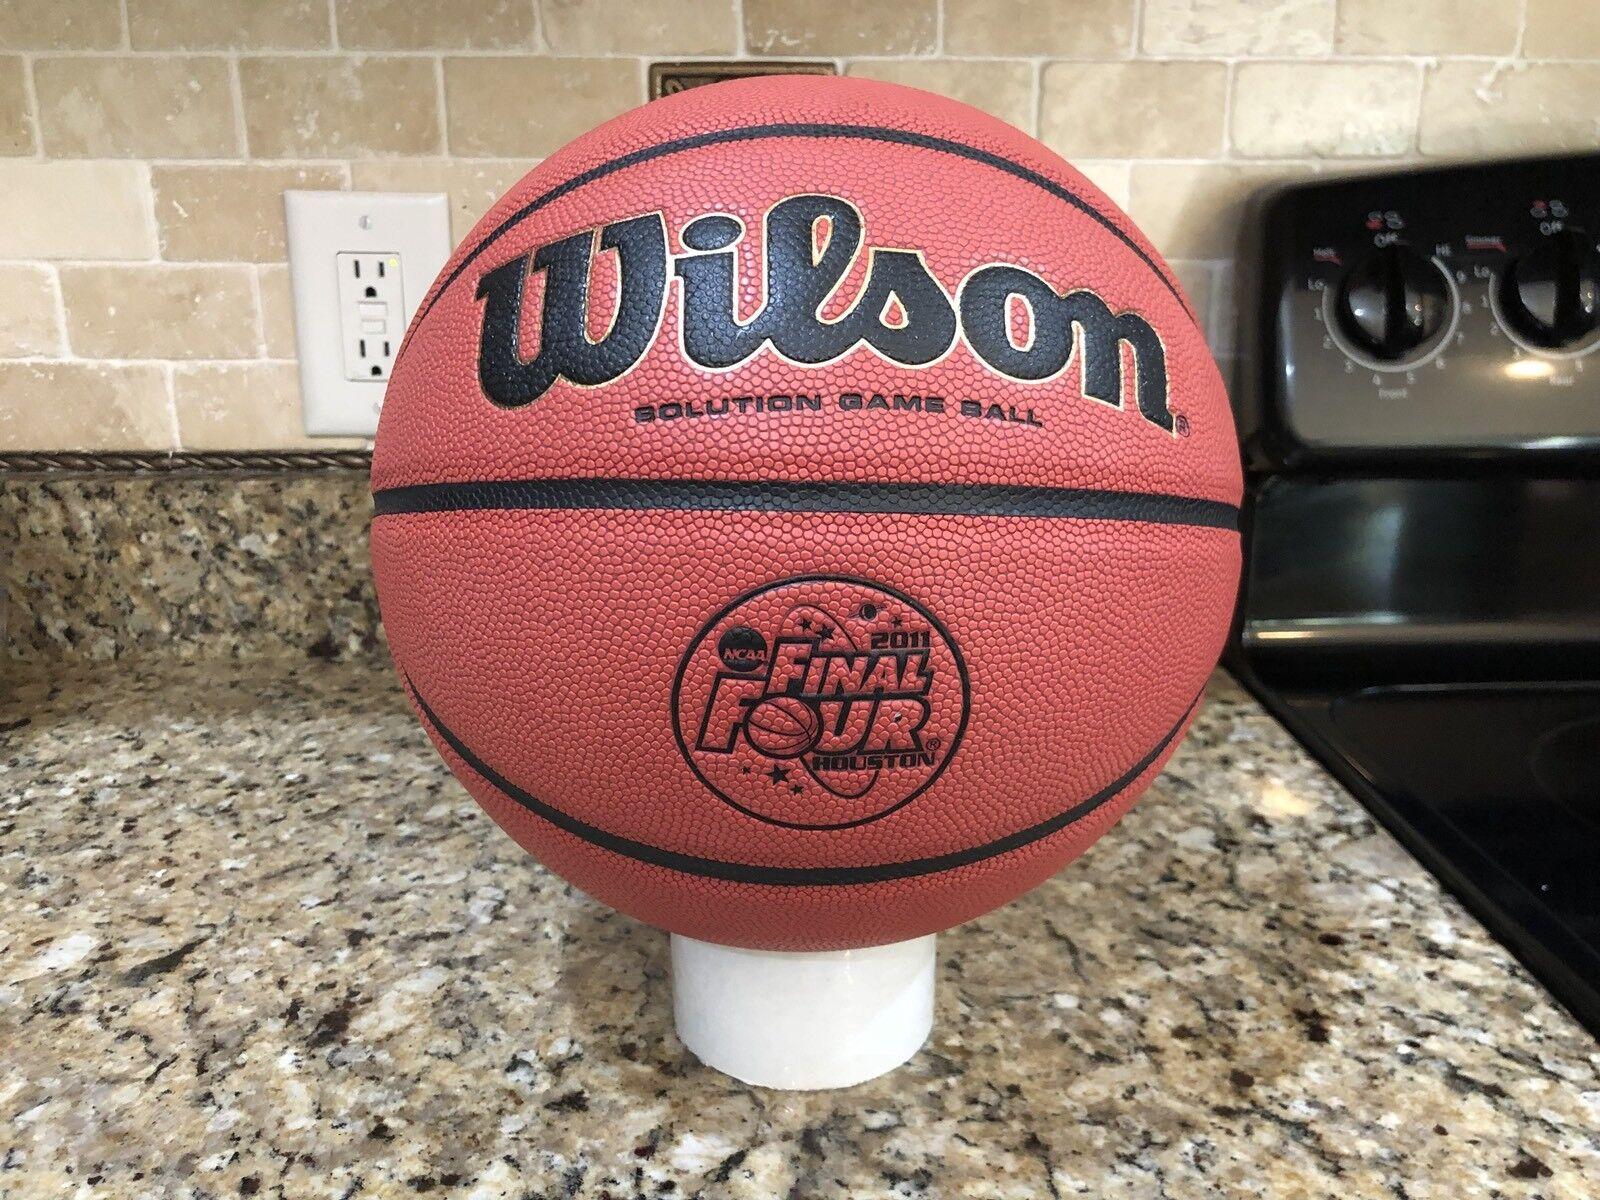 178d24c0a86 Official Wilson 2011 NCAA Final Four Game Ball Leather Basketball  Evolution. Um ano sem a ...